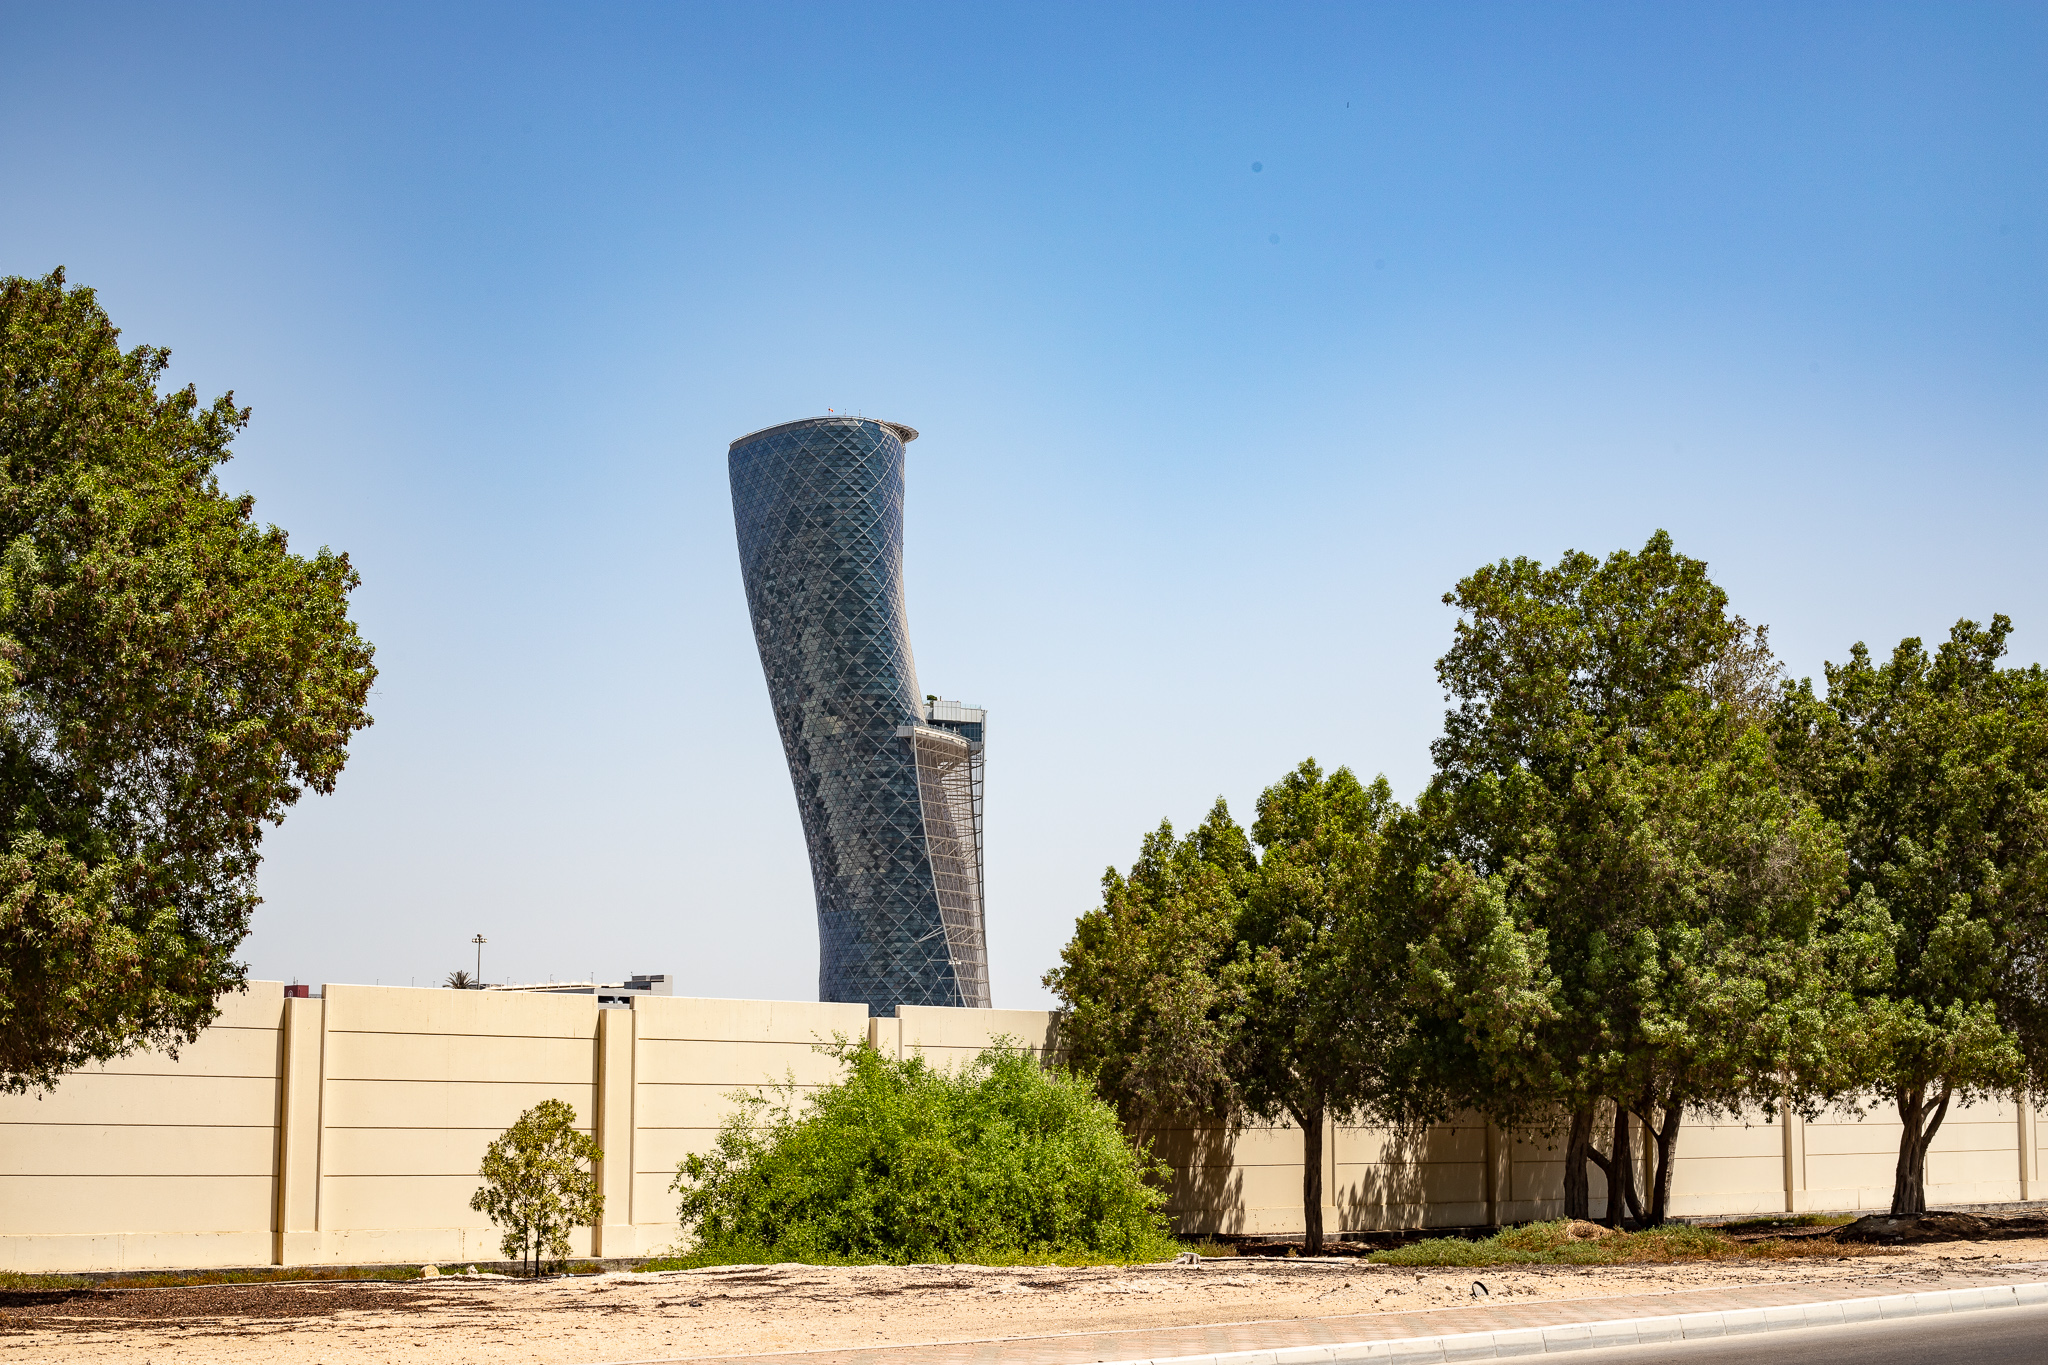 Capital Gate Tower, Abu Dhabi, United Arab Emirates